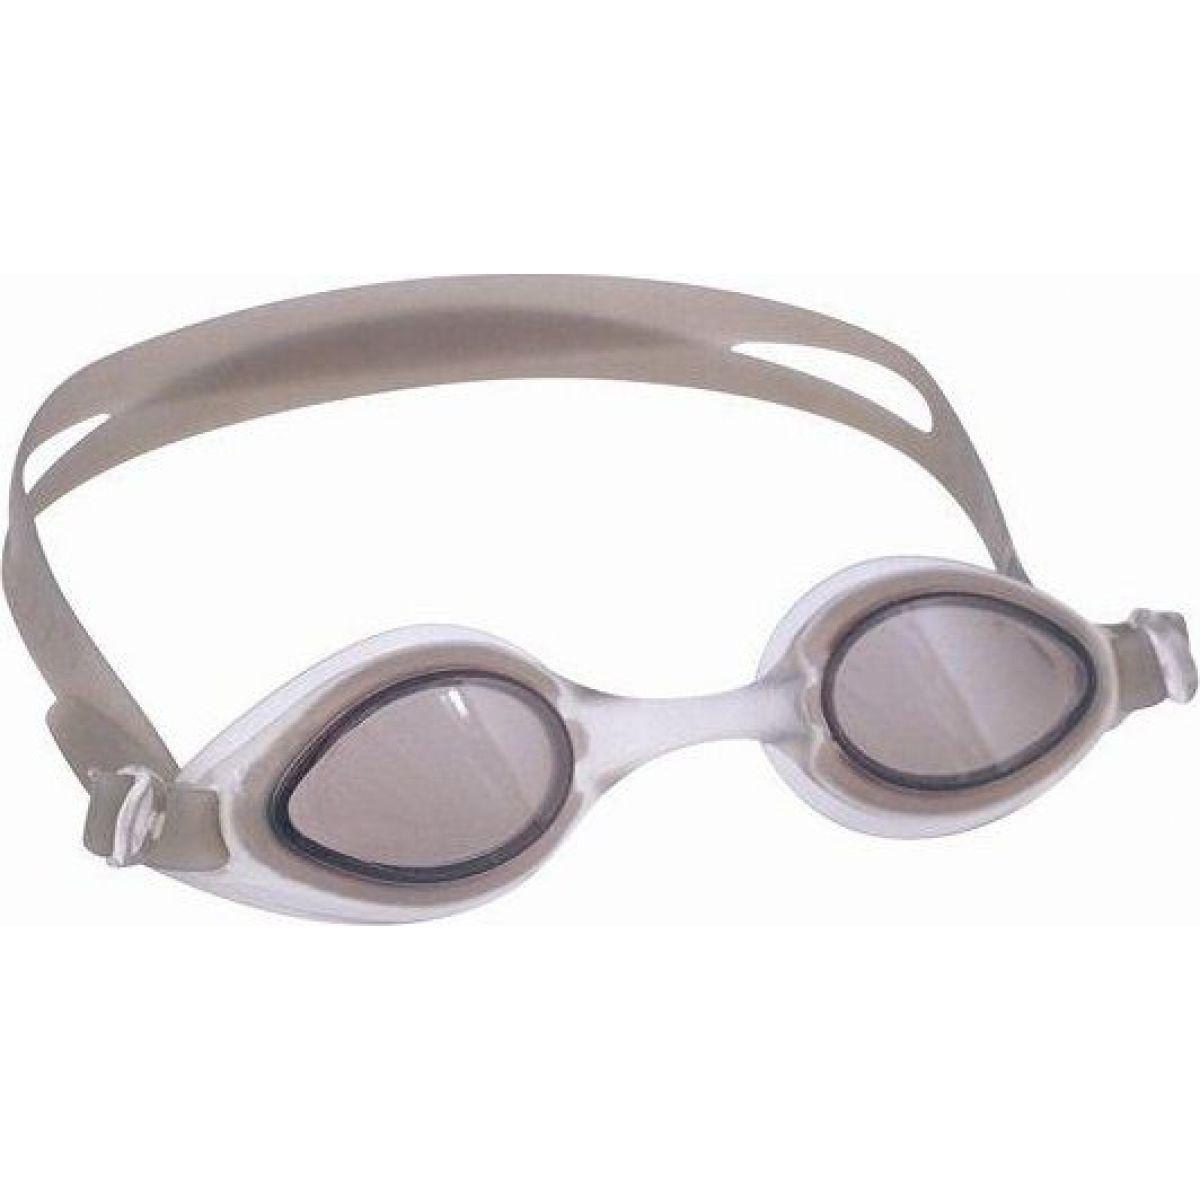 Bestway Plavecké brýle 7-14 let - Šedá